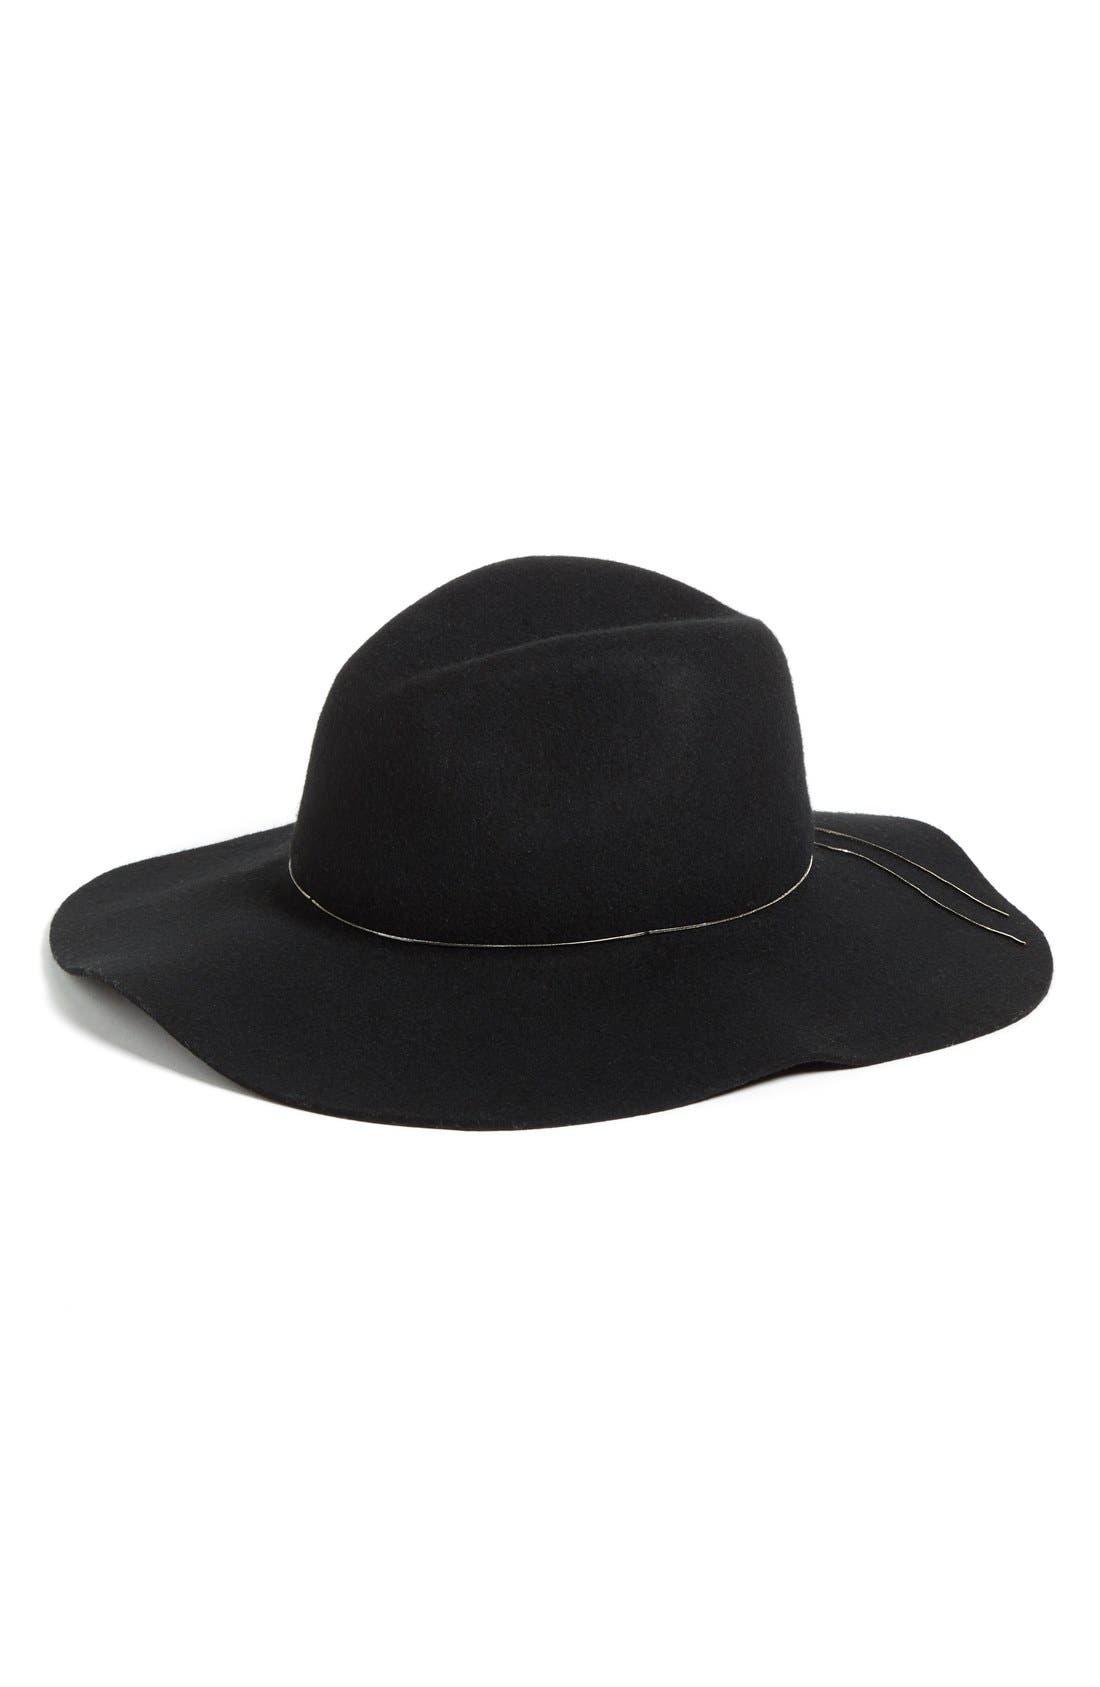 HINGE Floppy Wool Felt Hat, Main, color, 001